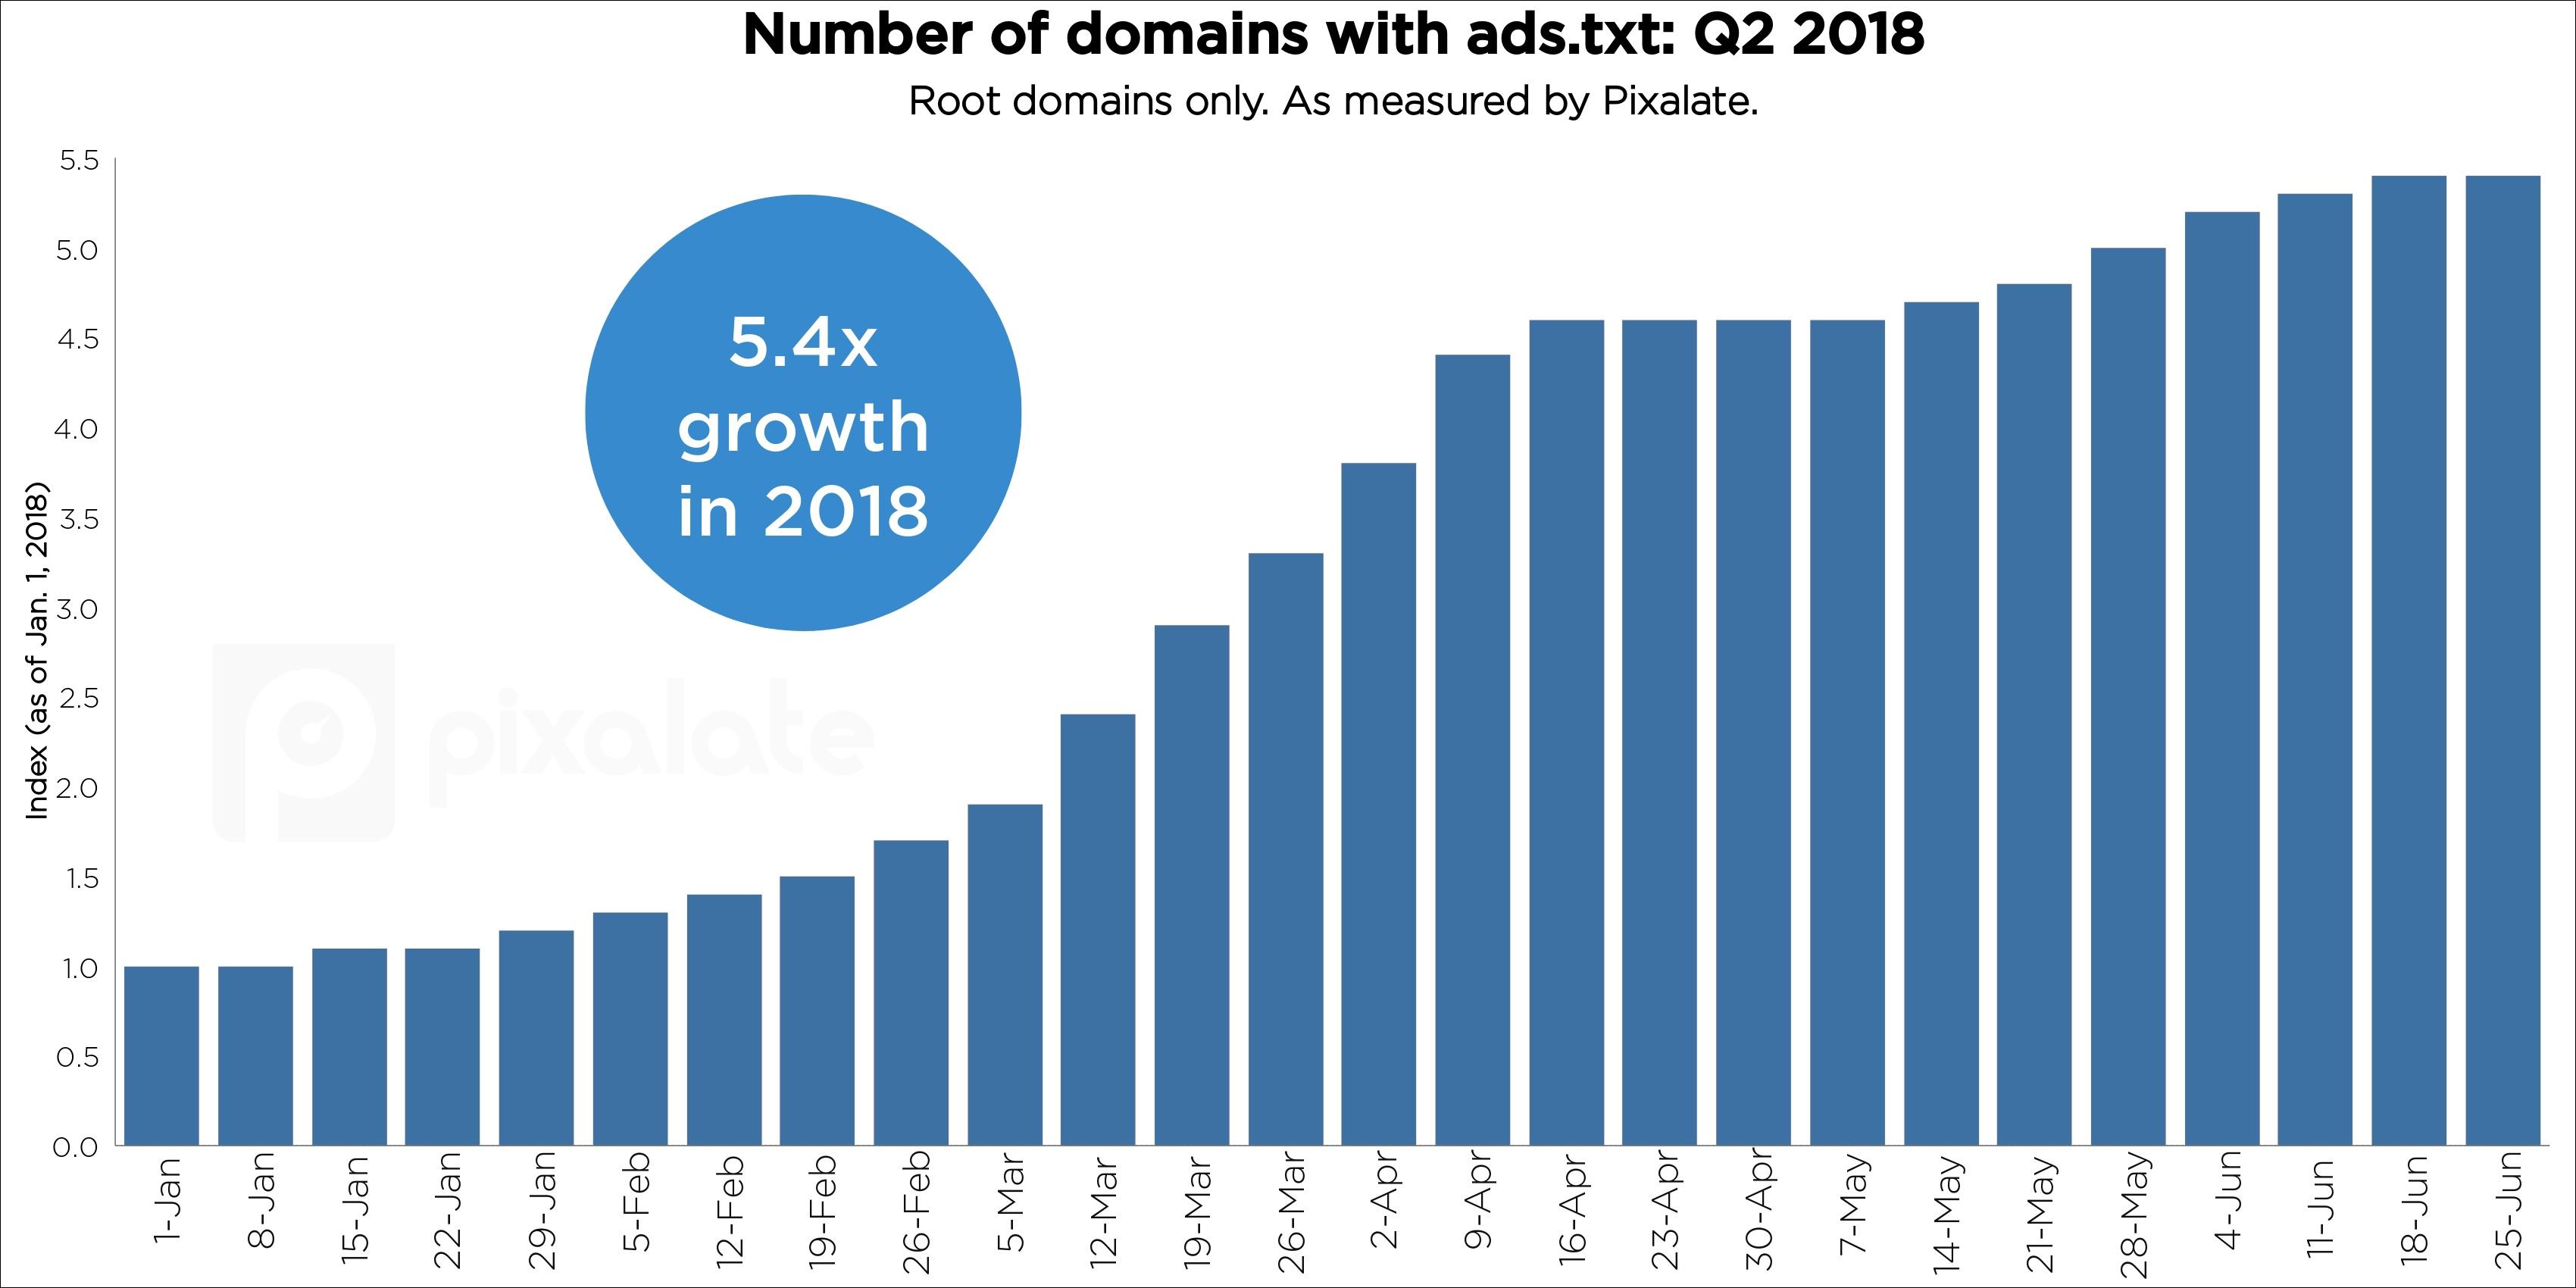 q2-2018-ads-txt-trends